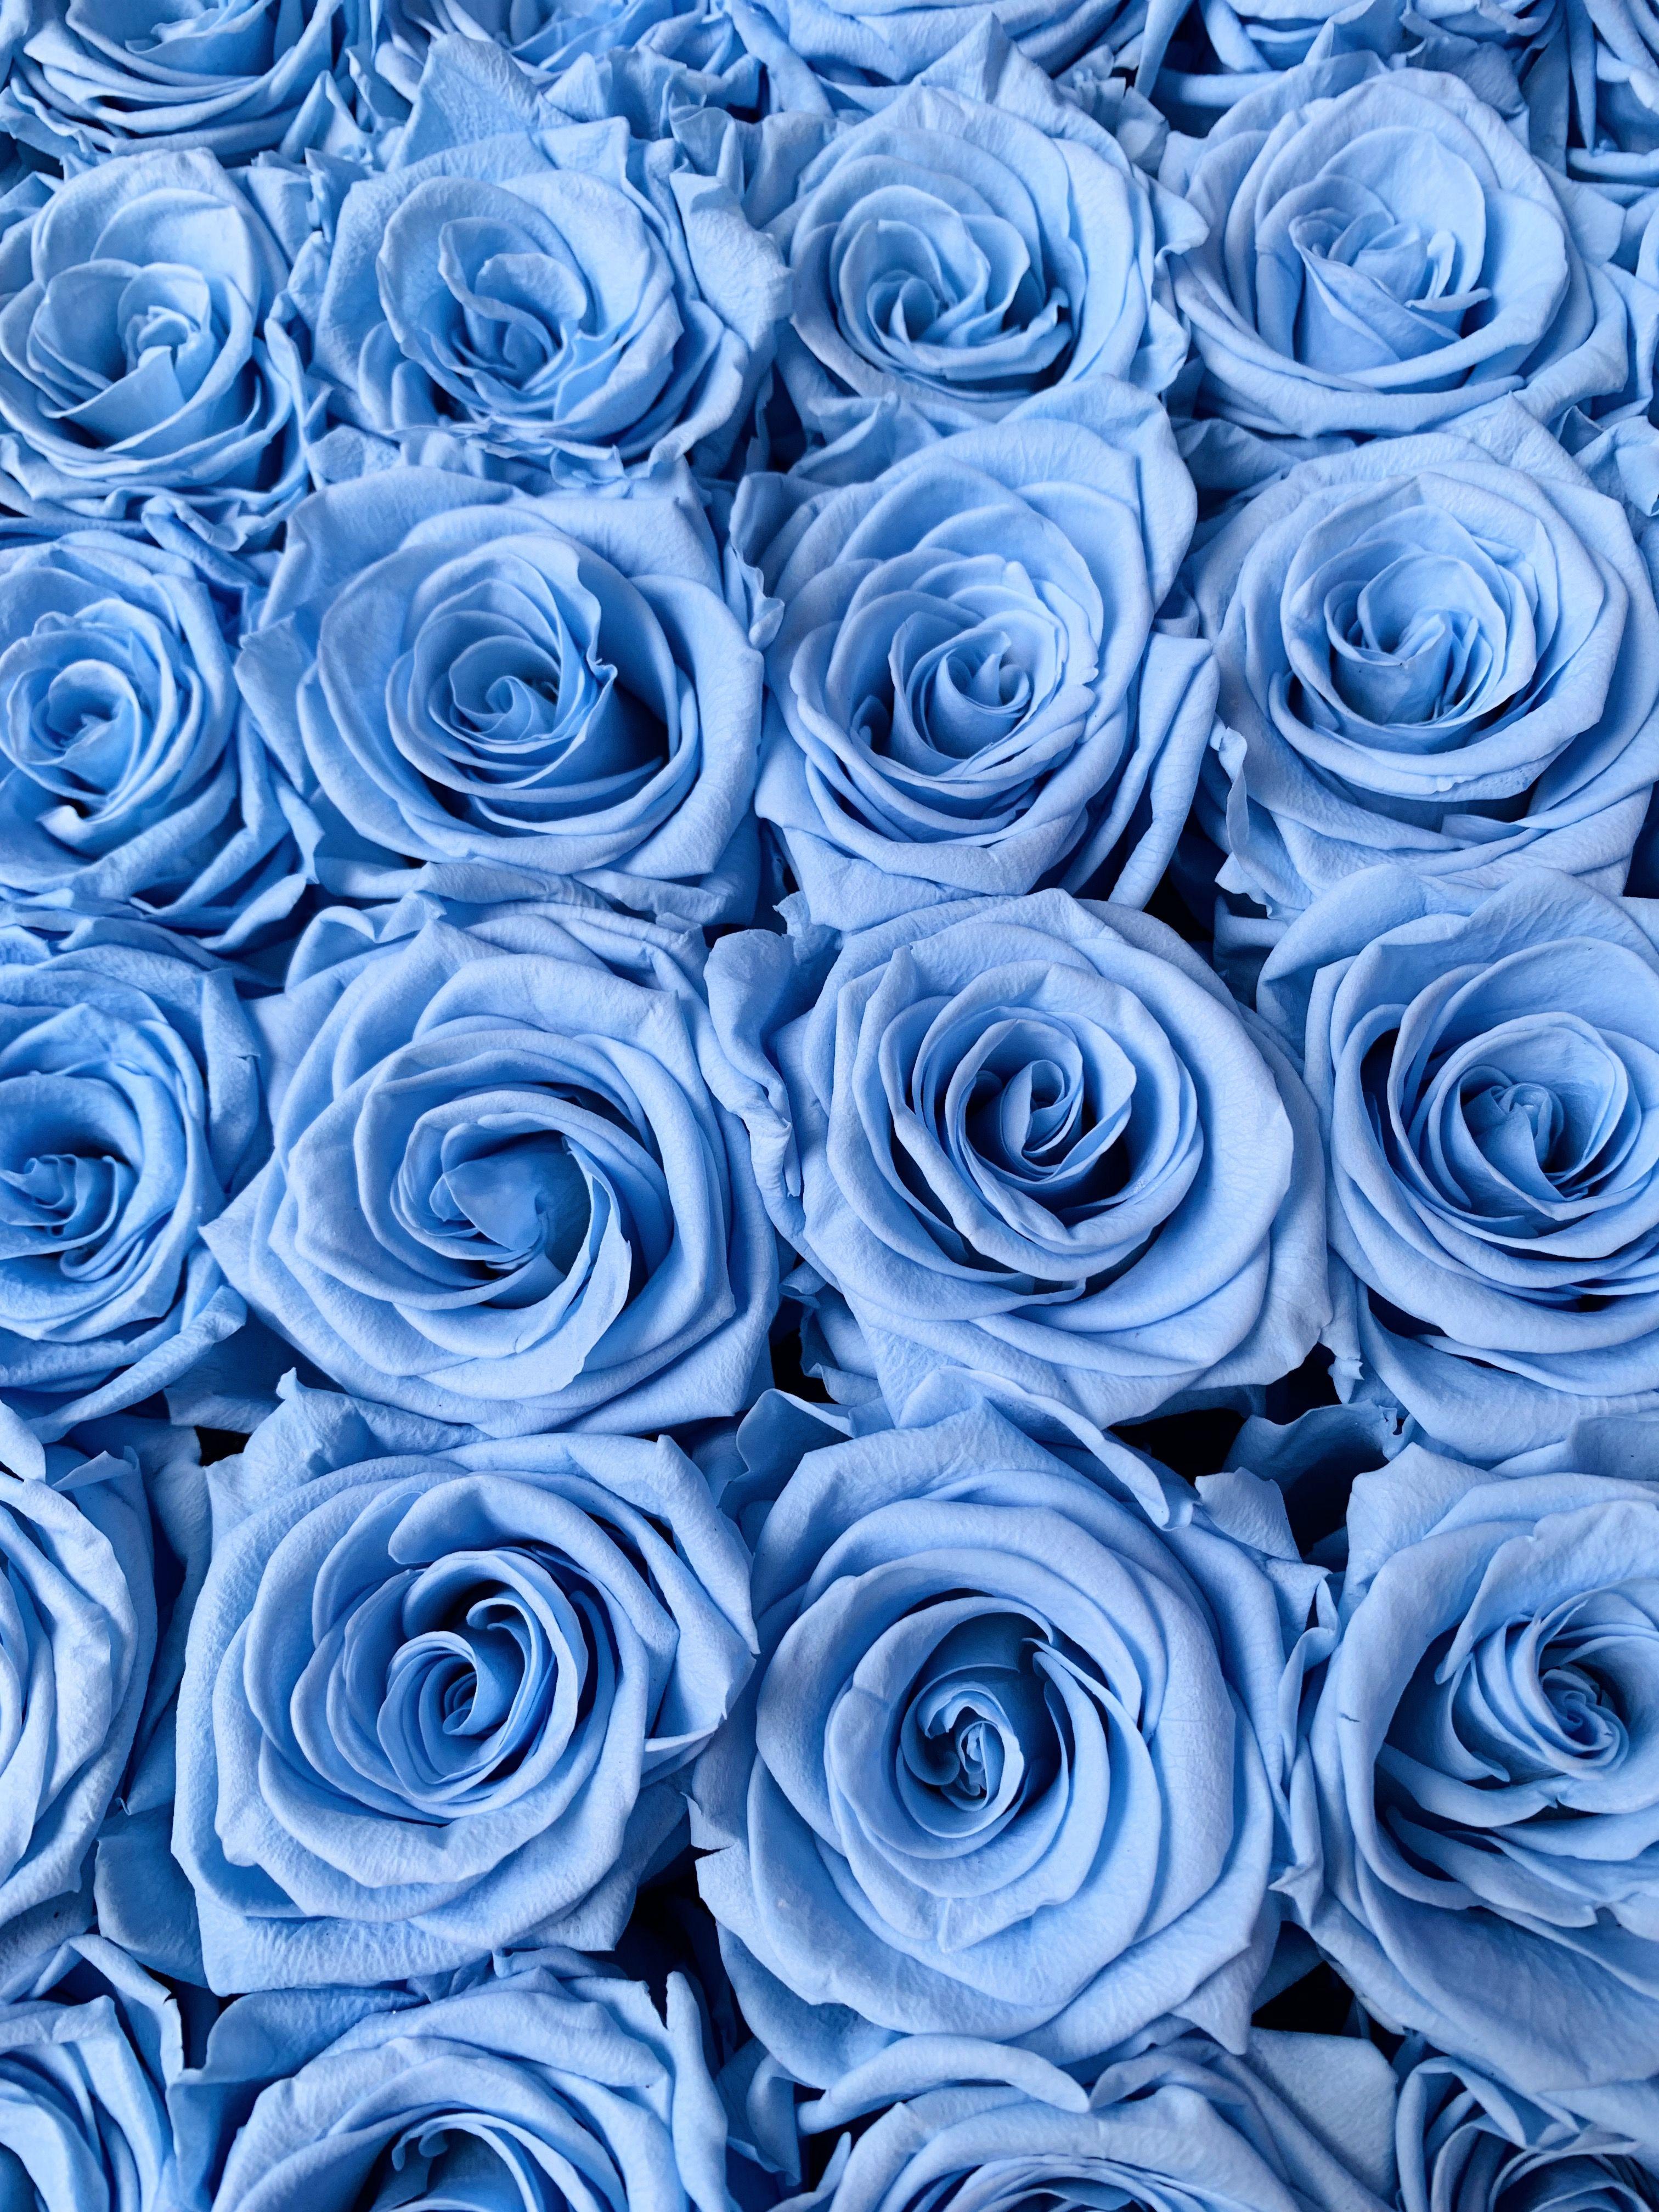 Baby Blue Roses Hintergrundbilder Blau Rosenbilder Rosen Hintergrundbilder